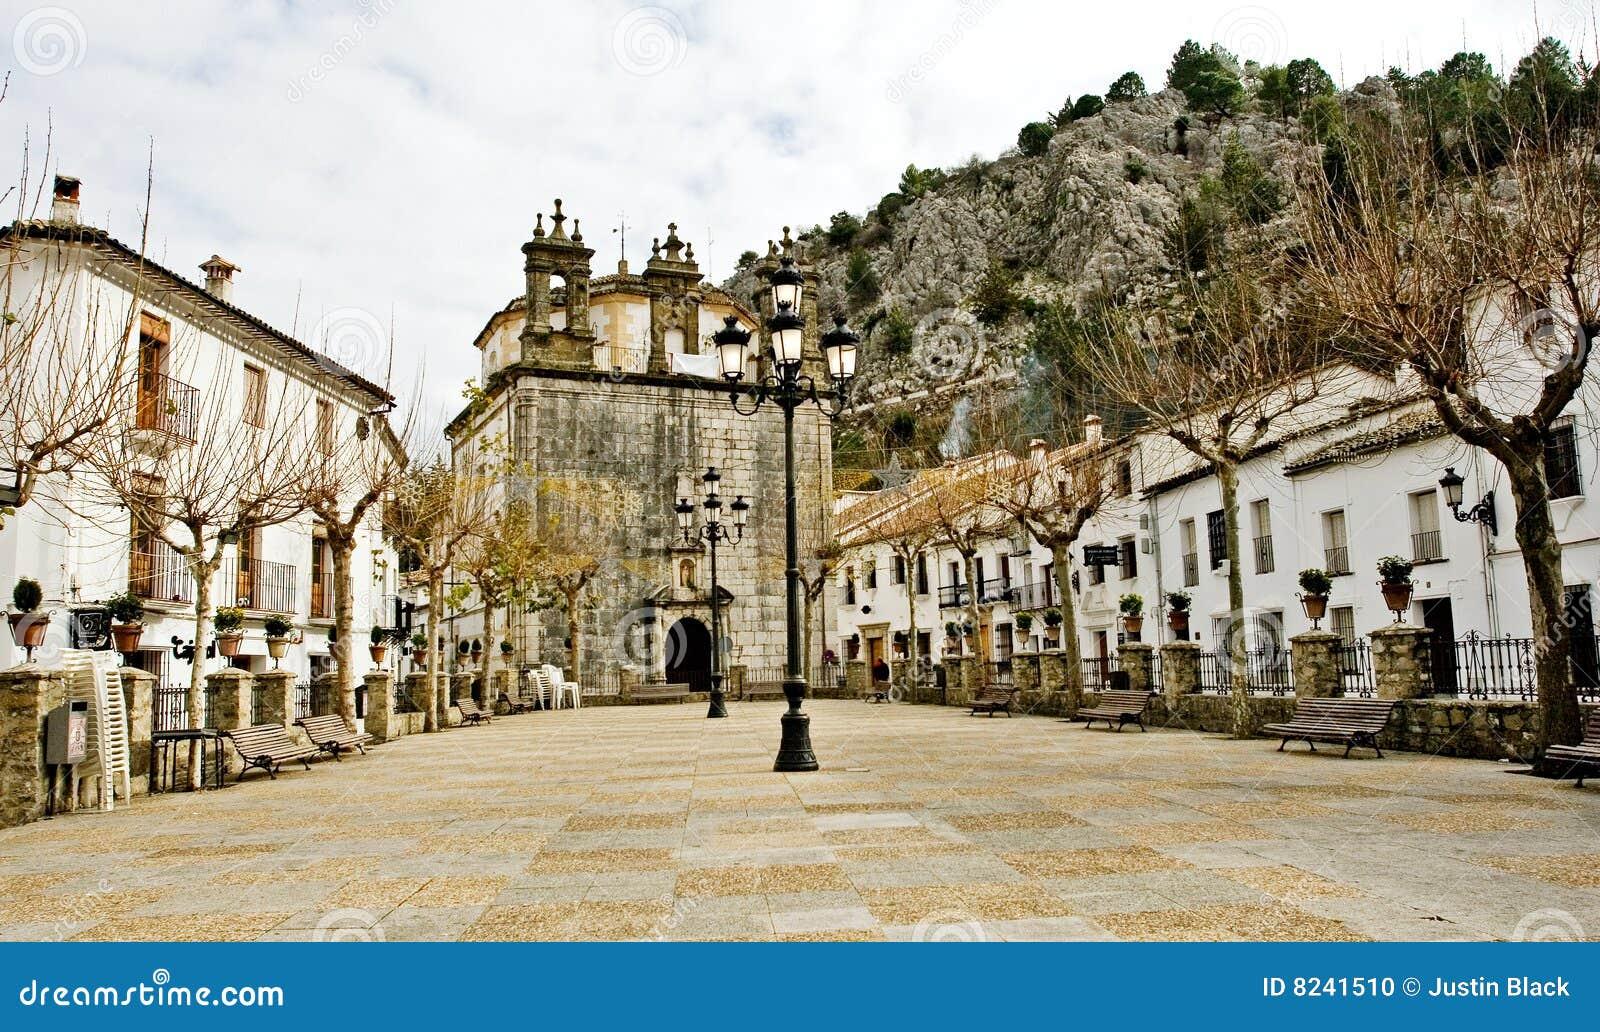 Grazalema Spain  city photos gallery : Small Village Of Grazalema, Spain Stock Photo Image: 8241510